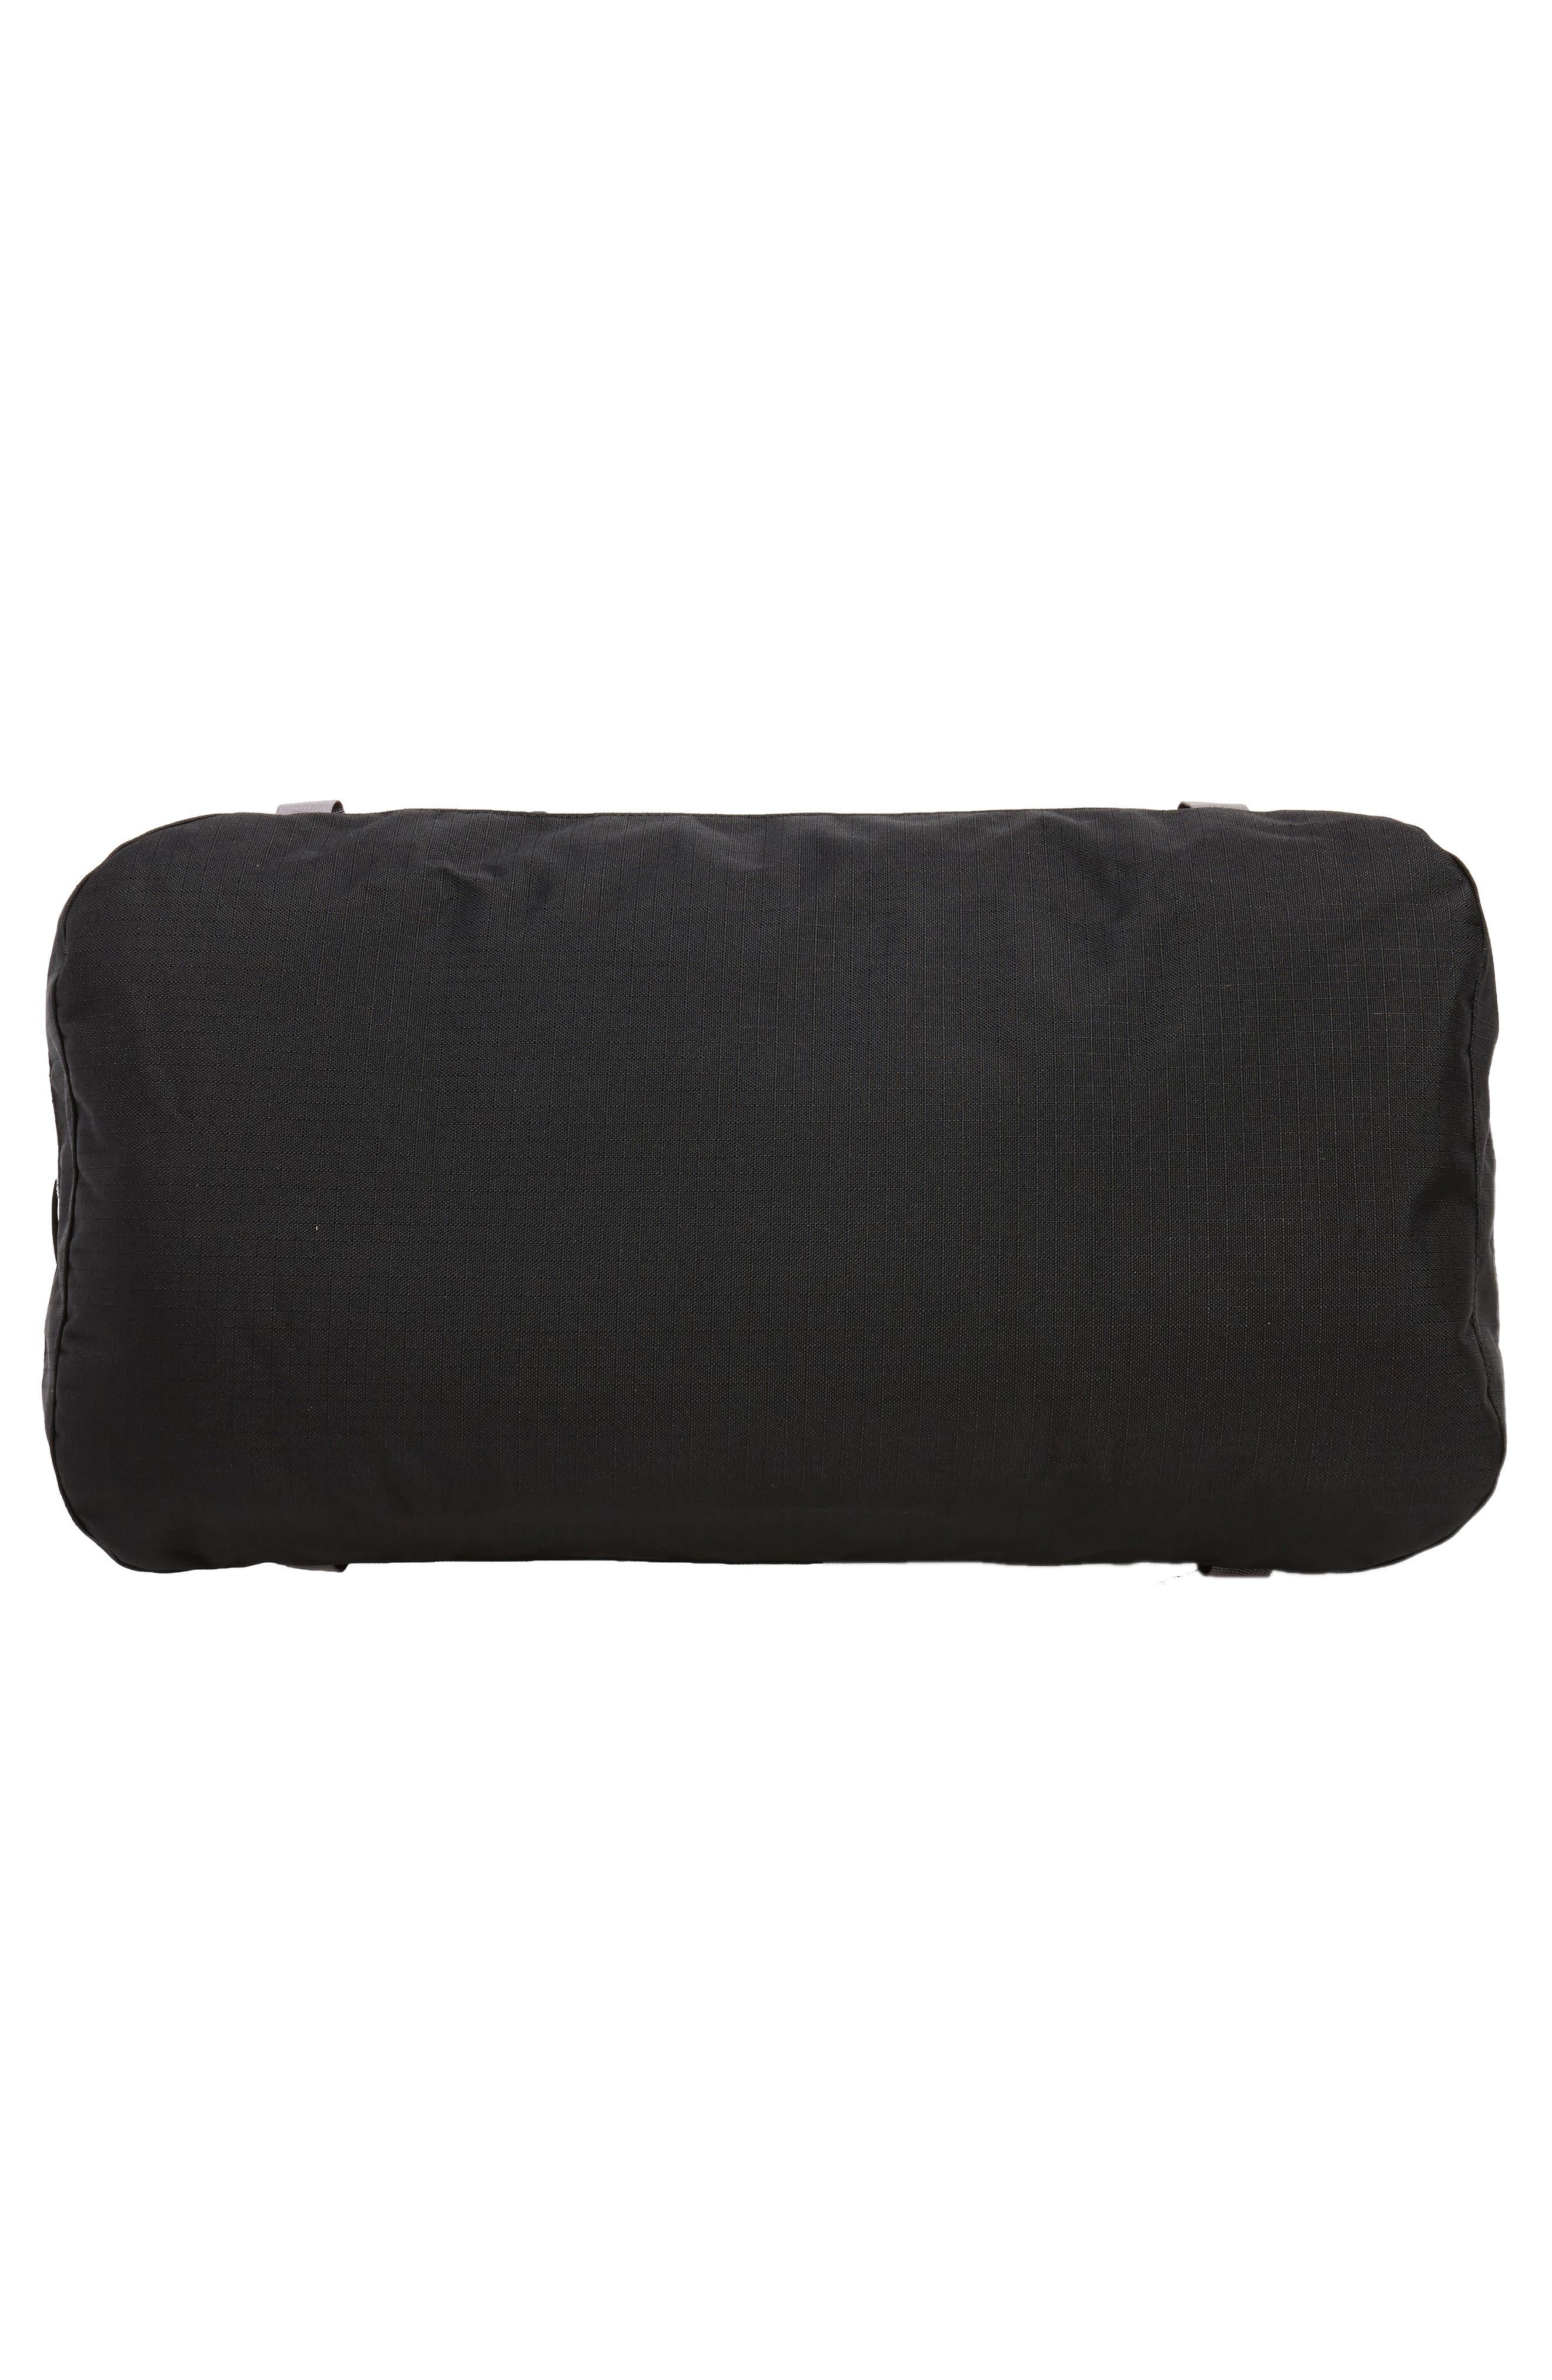 Black Hole Water Repellent Duffel Bag,                             Alternate thumbnail 6, color,                             001